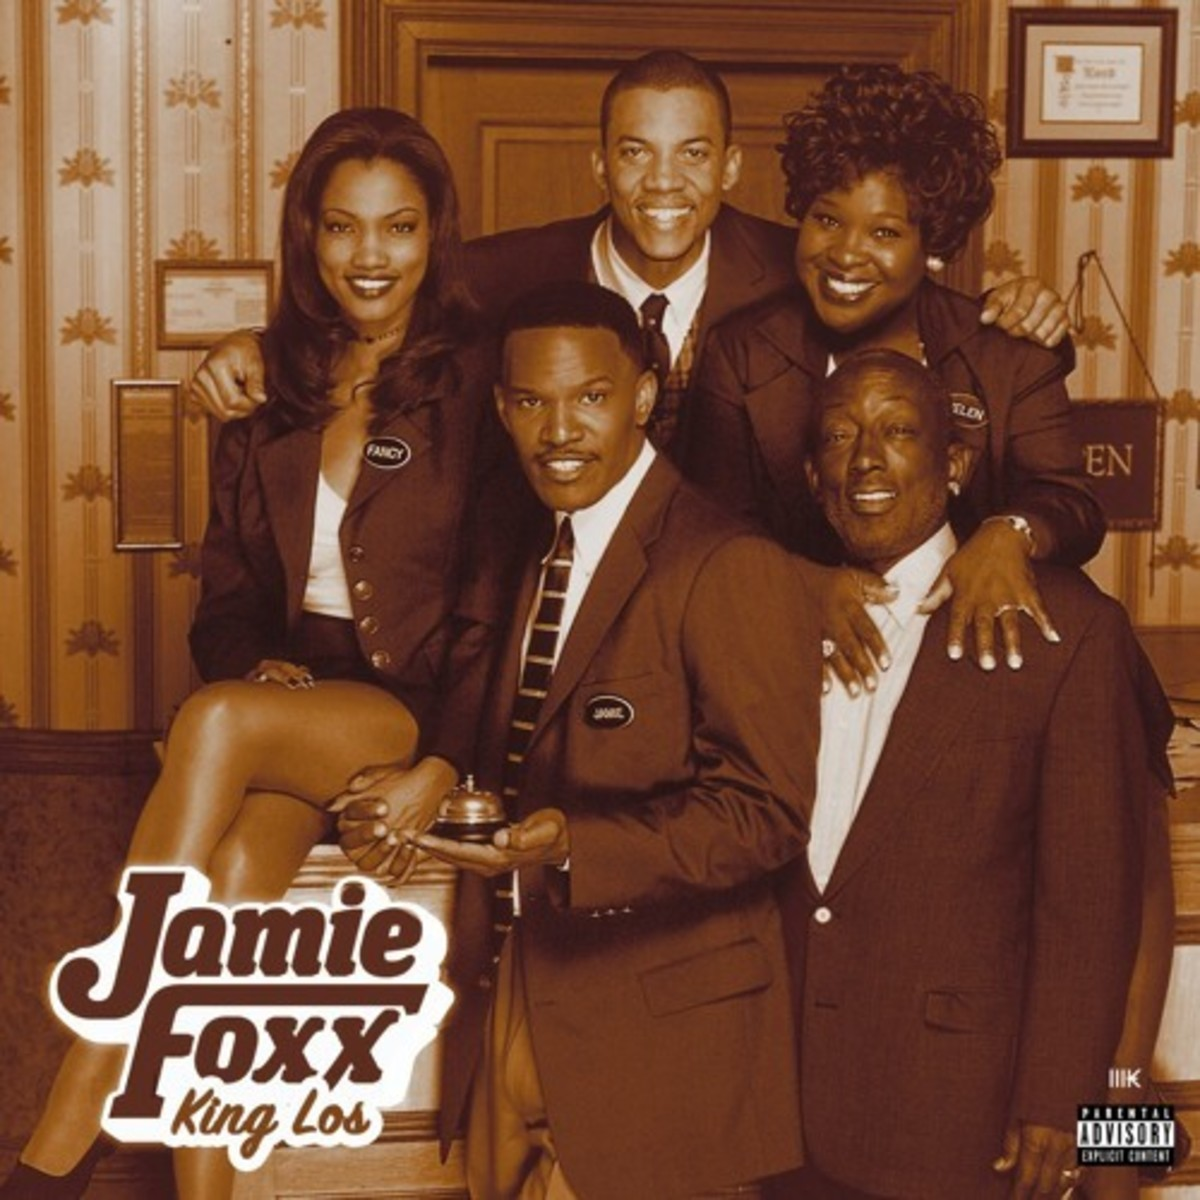 king-los-jamie-foxx.jpg